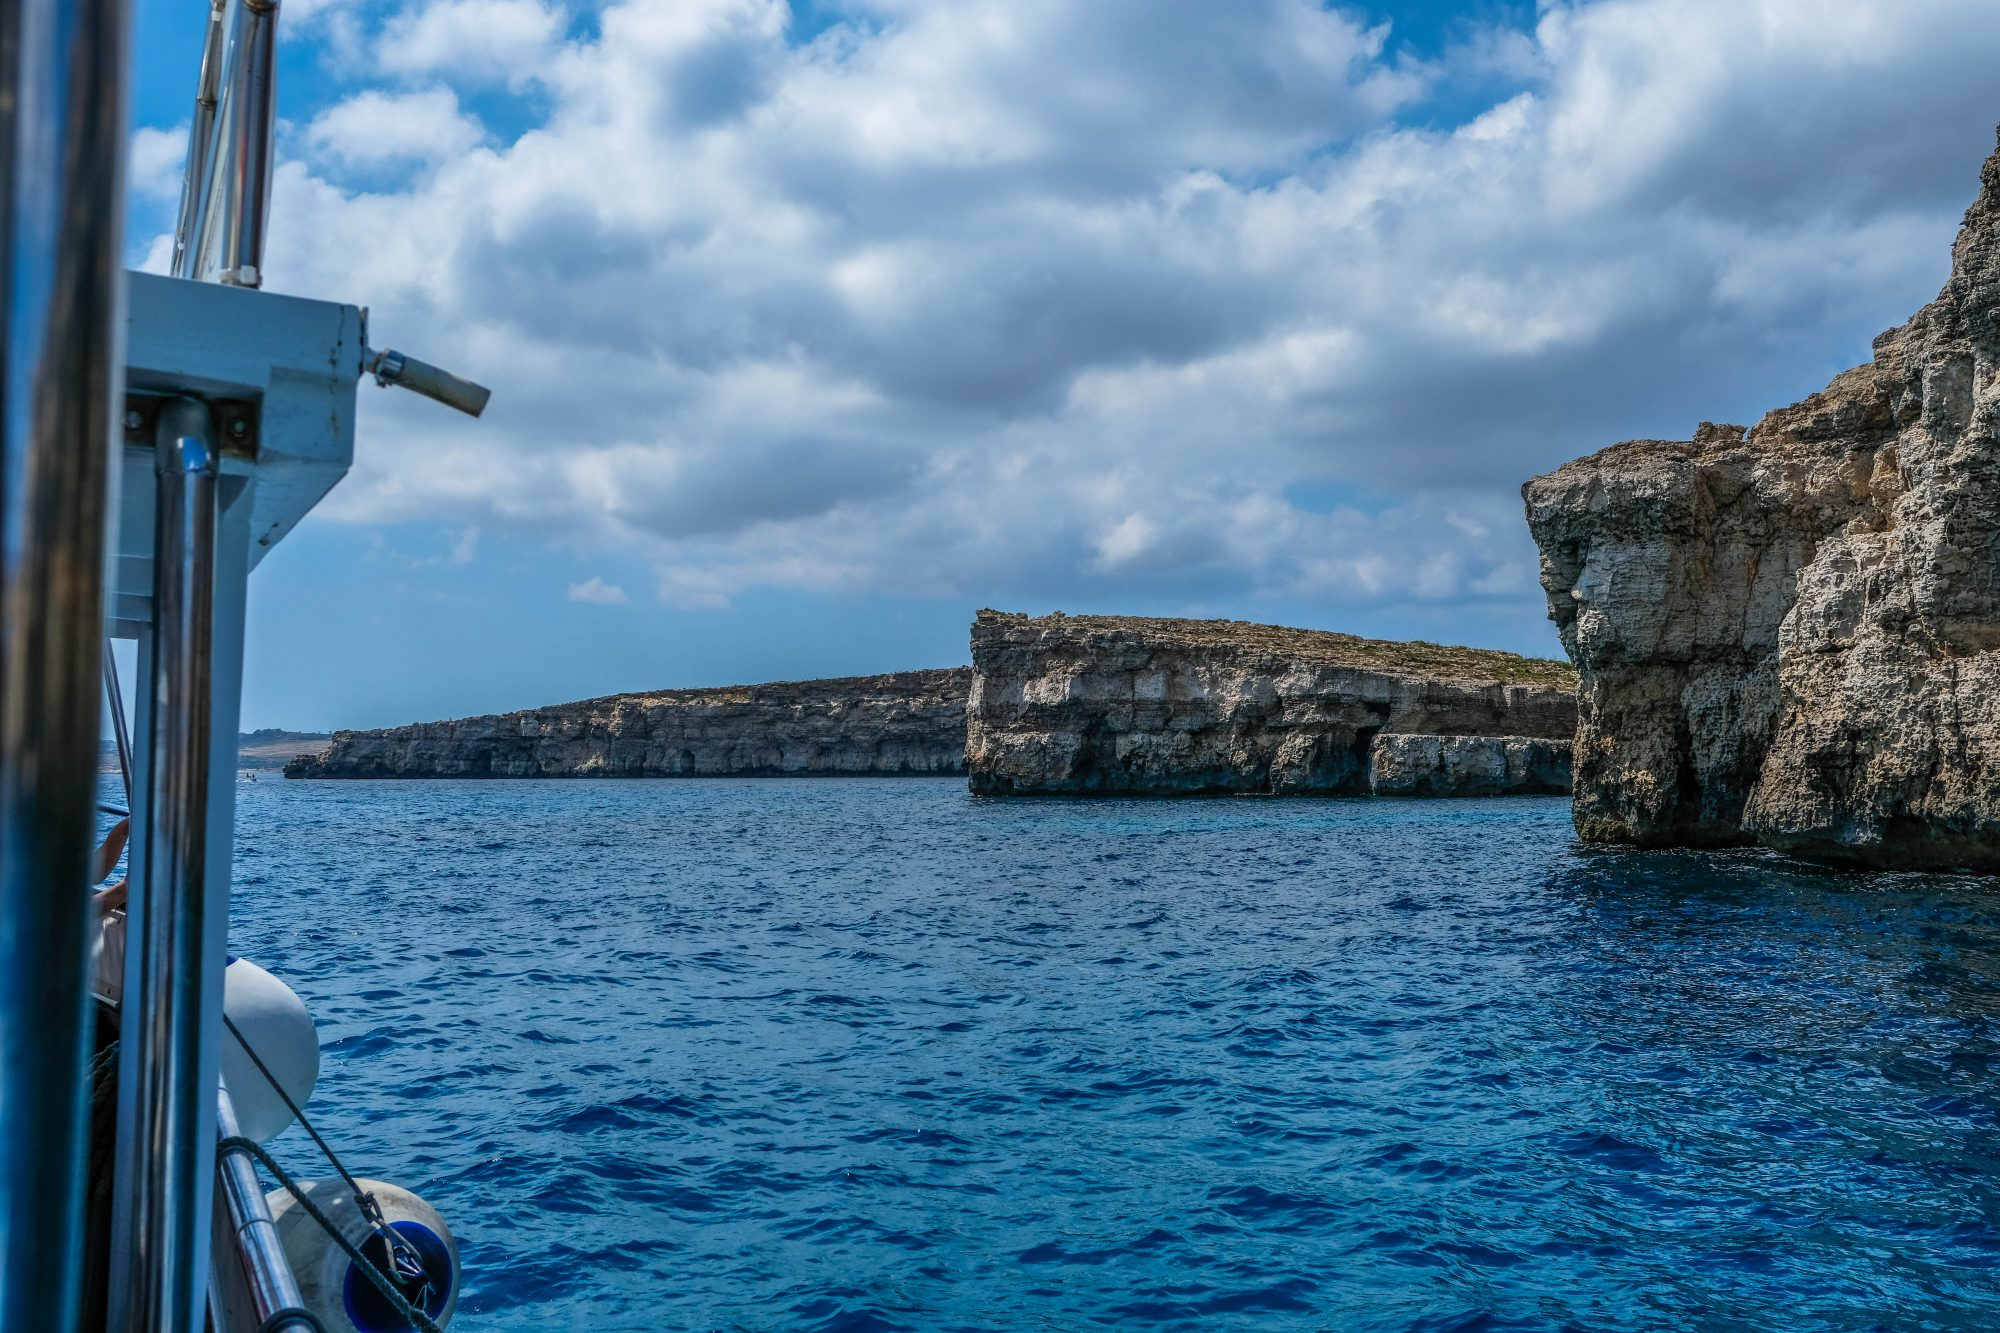 Arrivée sur Comino - Malte